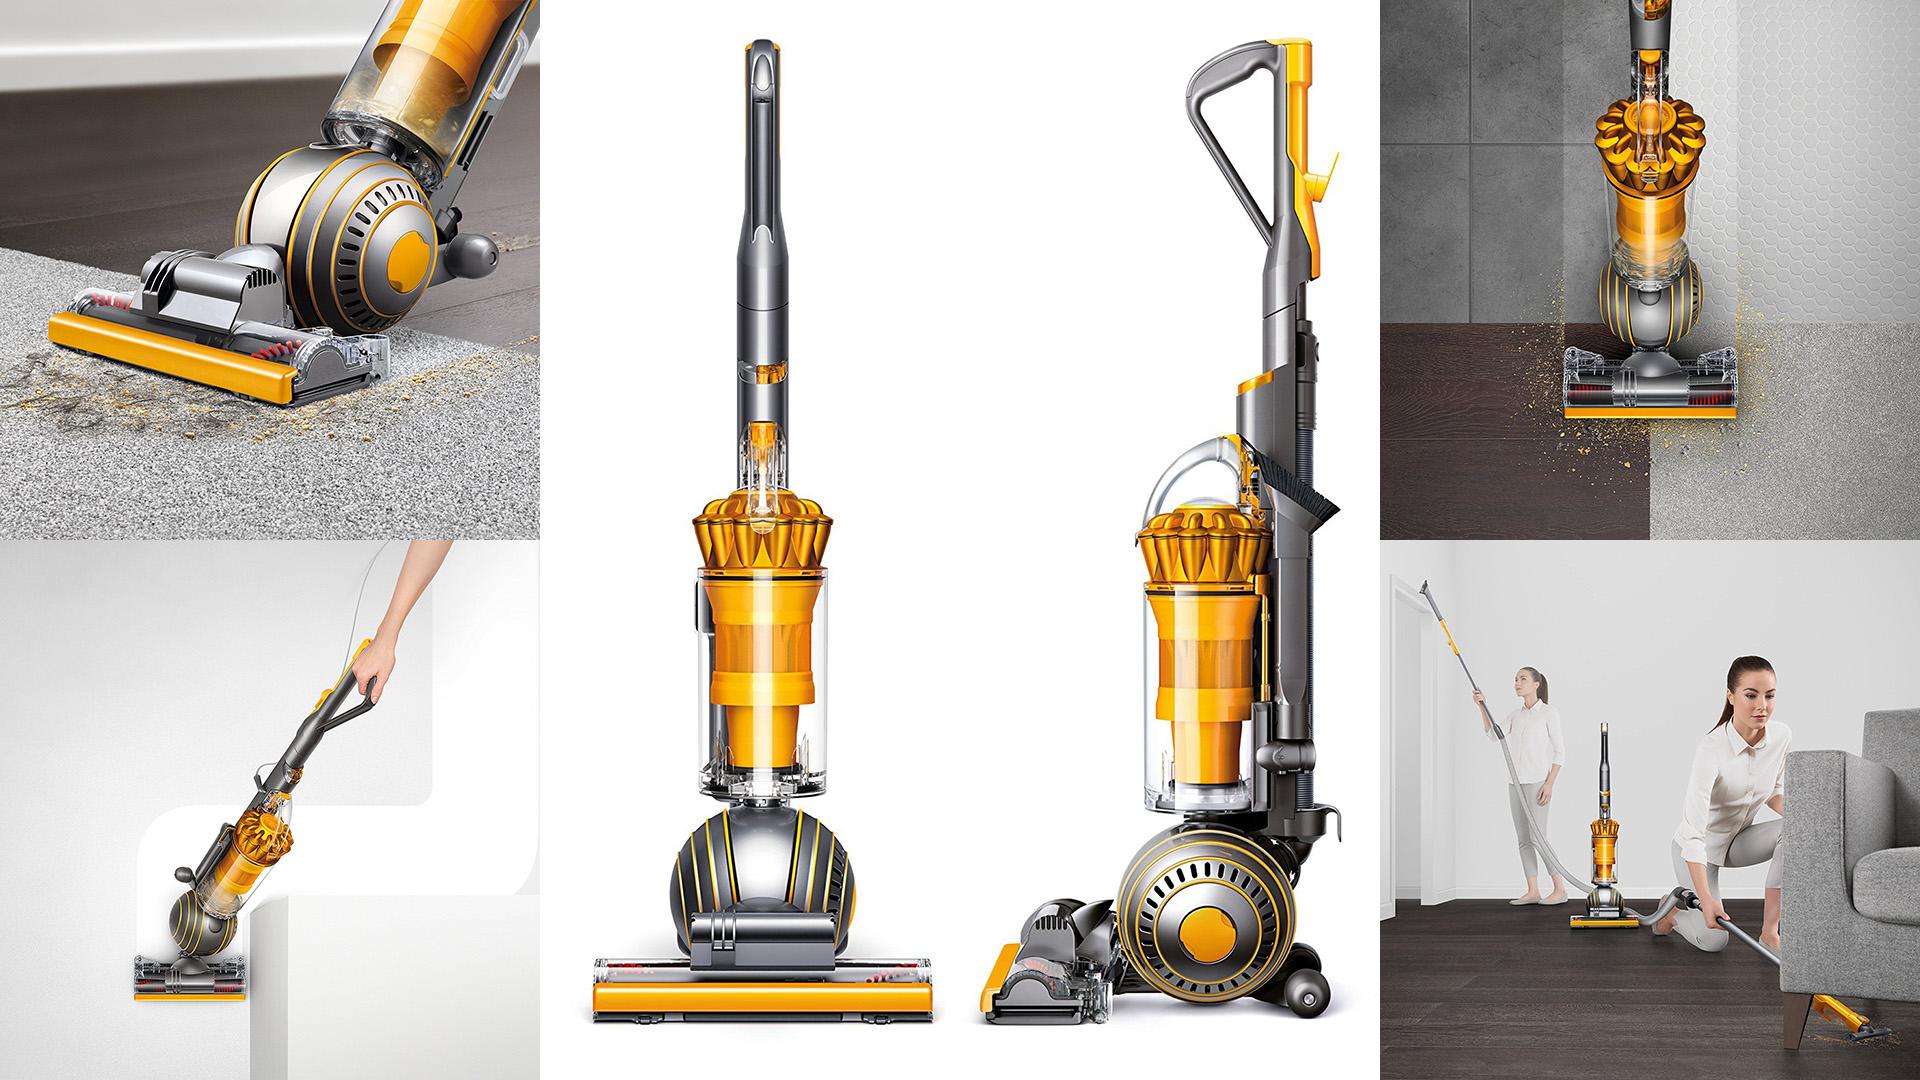 Dyson Ball Multi Floor 2 Upright Vacuum | The #1 Vacuum Cleaner